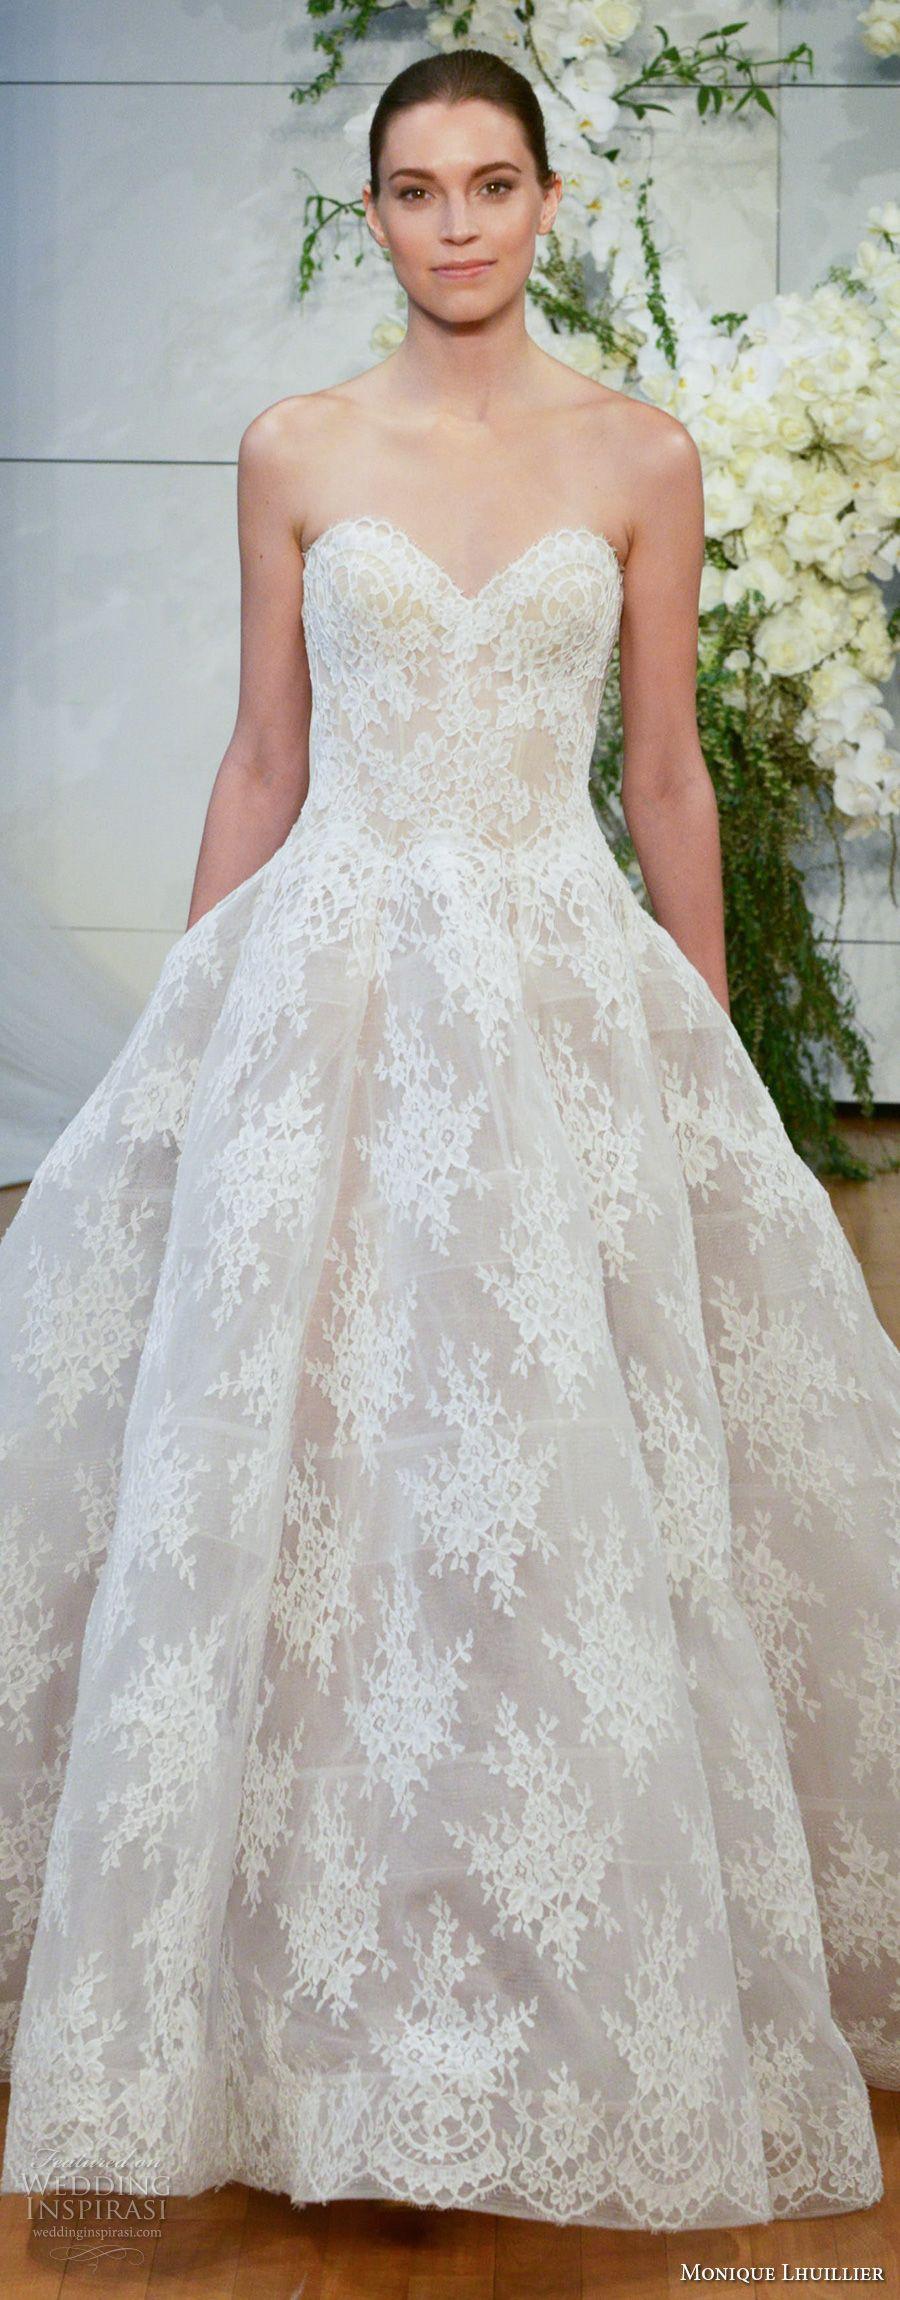 Monique Lhuillier Spring 2018 Wedding Dresses — New York Bridal ...